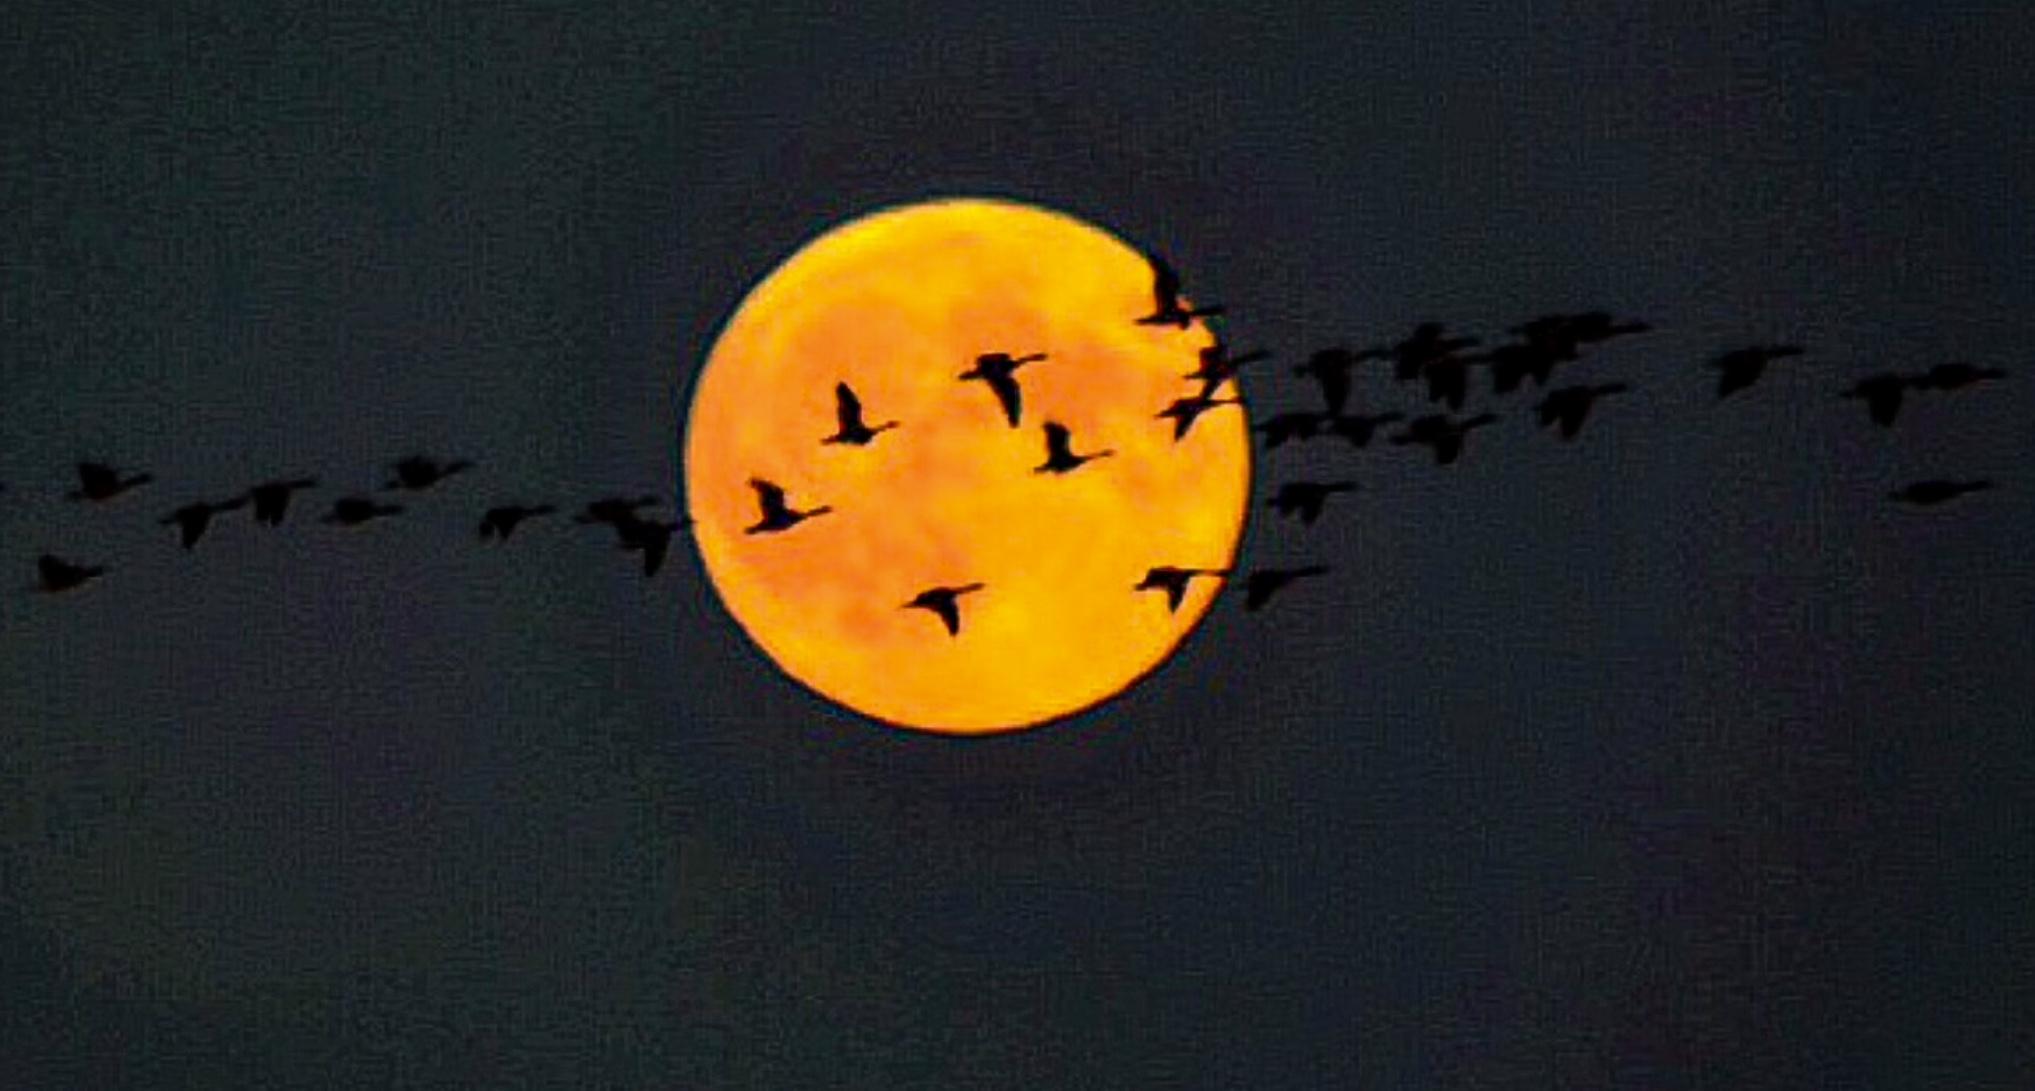 Full Moon and Geese.jpg